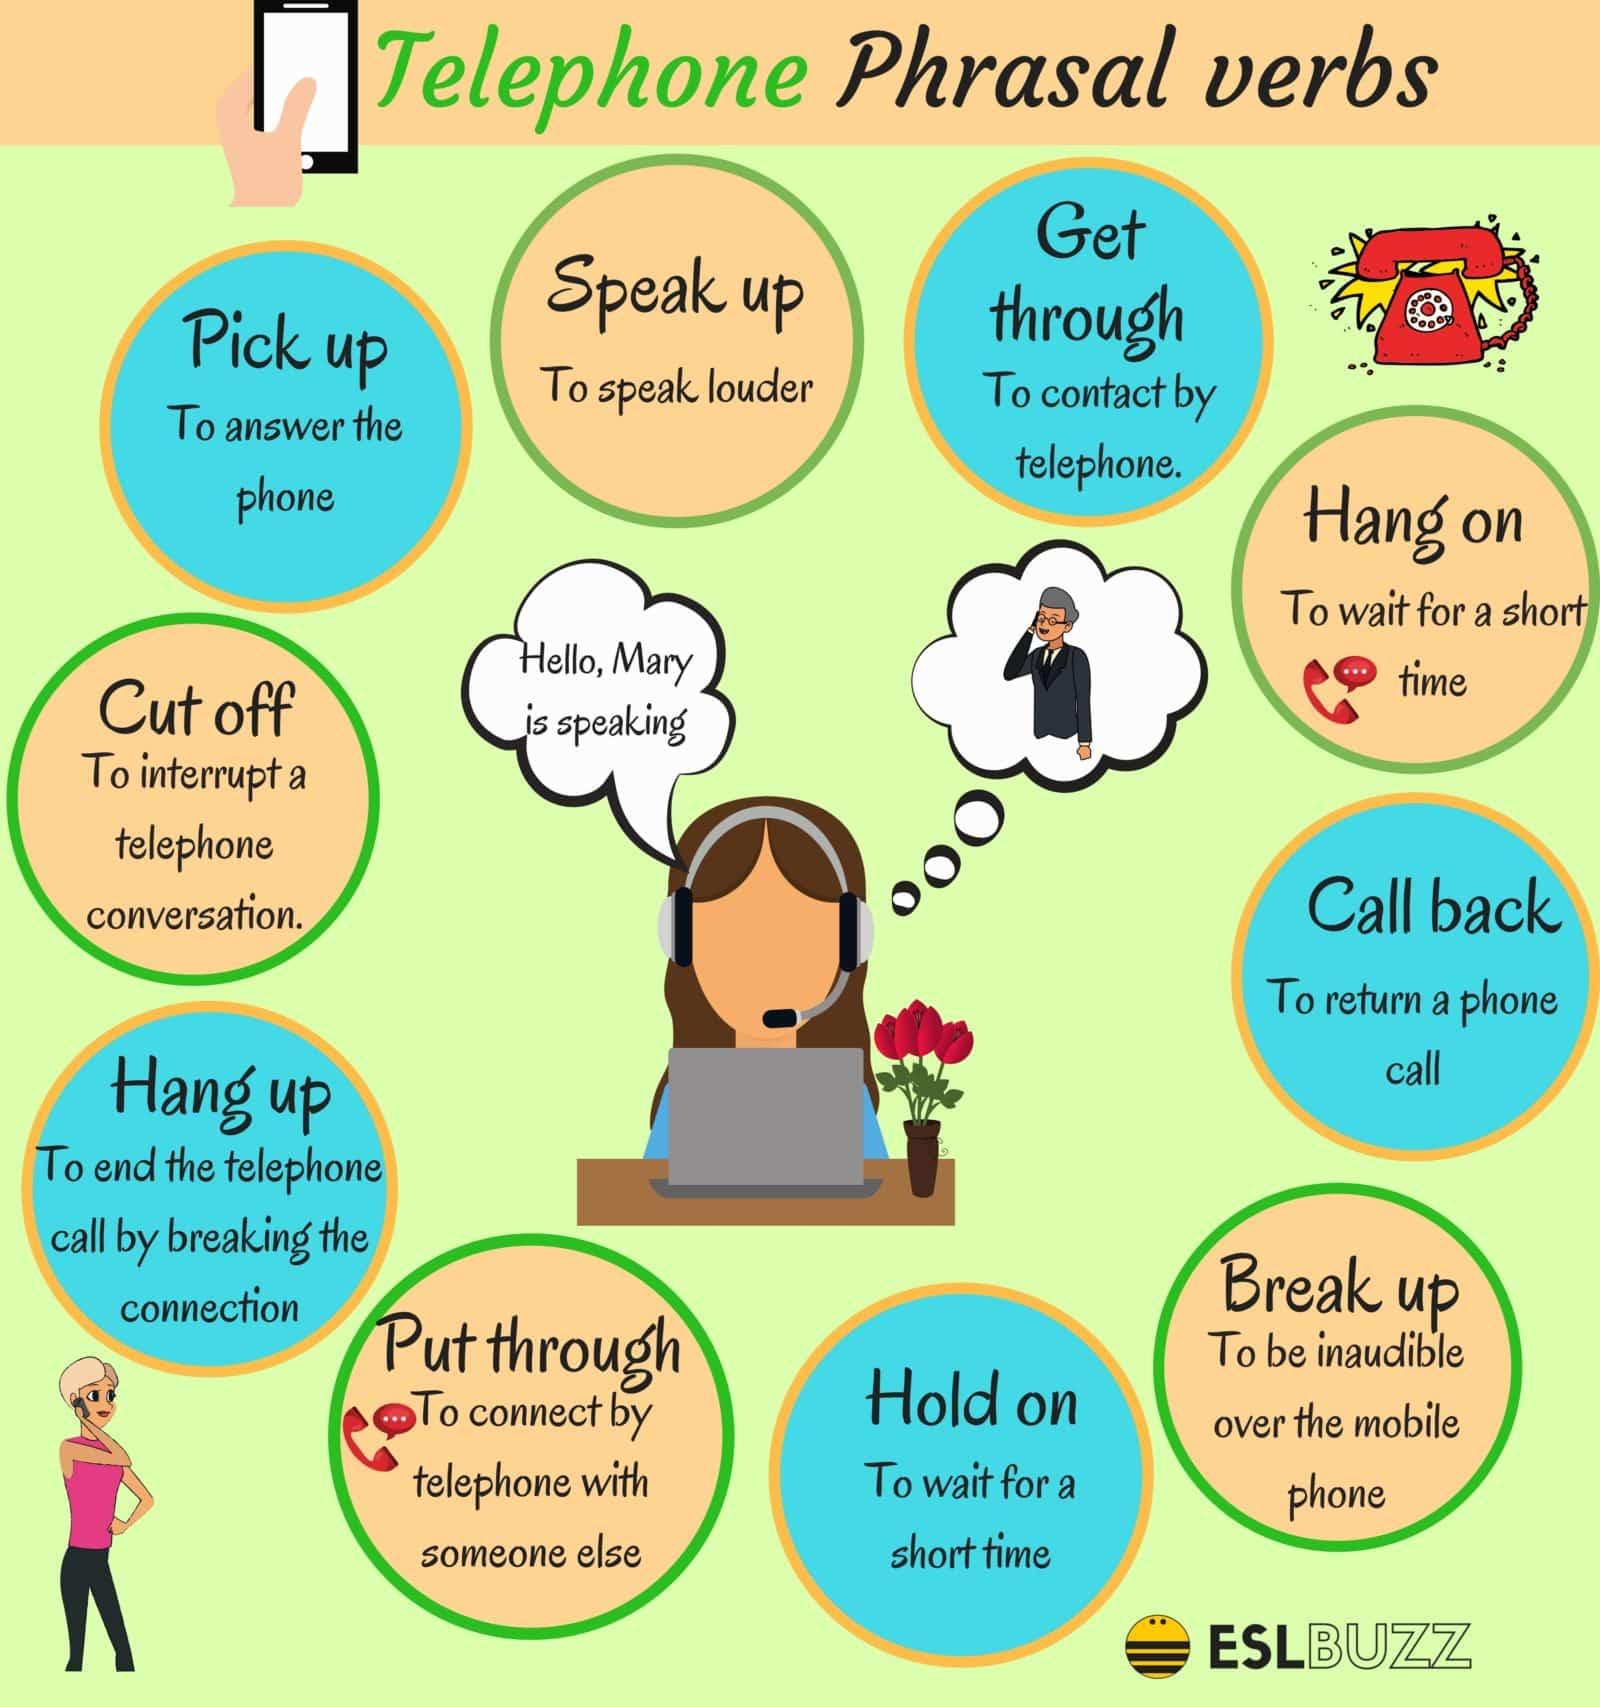 Common Telephone Phrasal Verbs in English 14